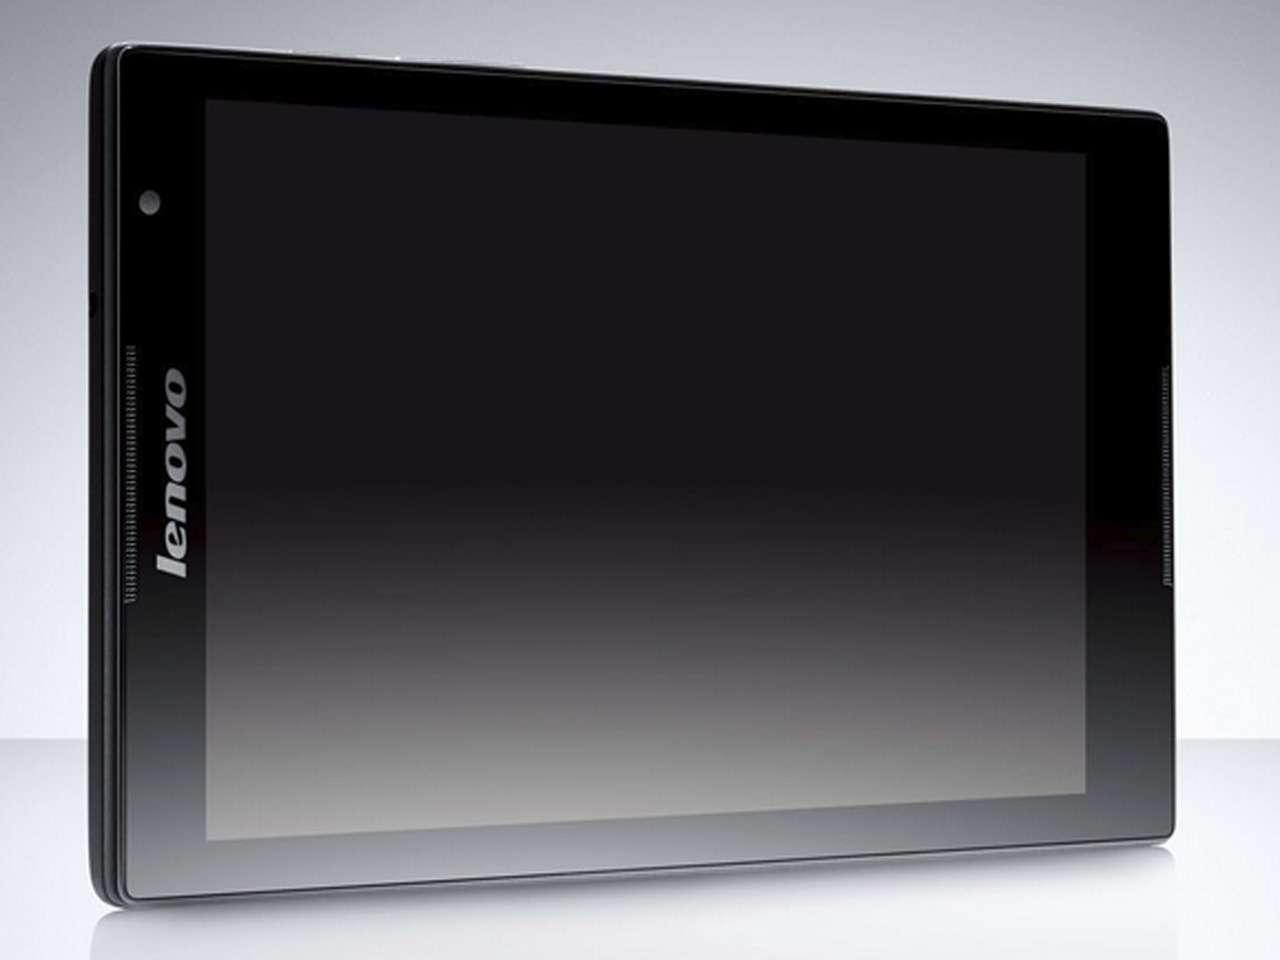 La Tab S8 pesa sólo 0,65 lb y tiene 0,31 pulgadas de espesor Foto: Lenovo